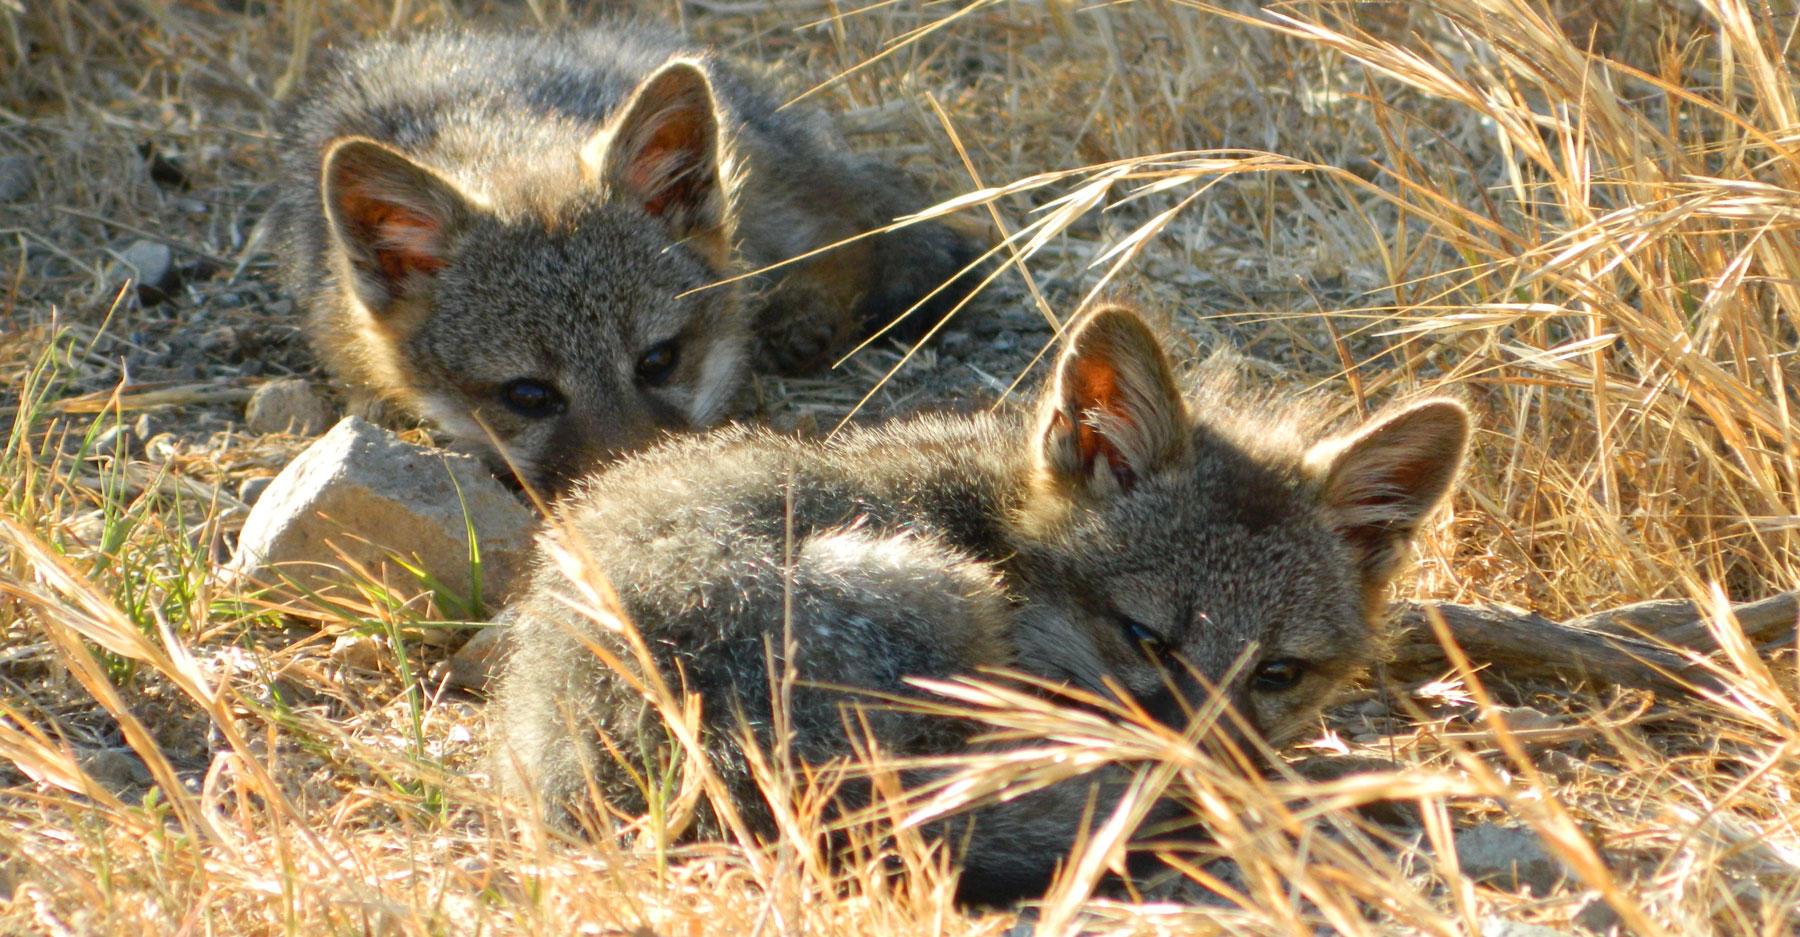 Catalina Island foxes